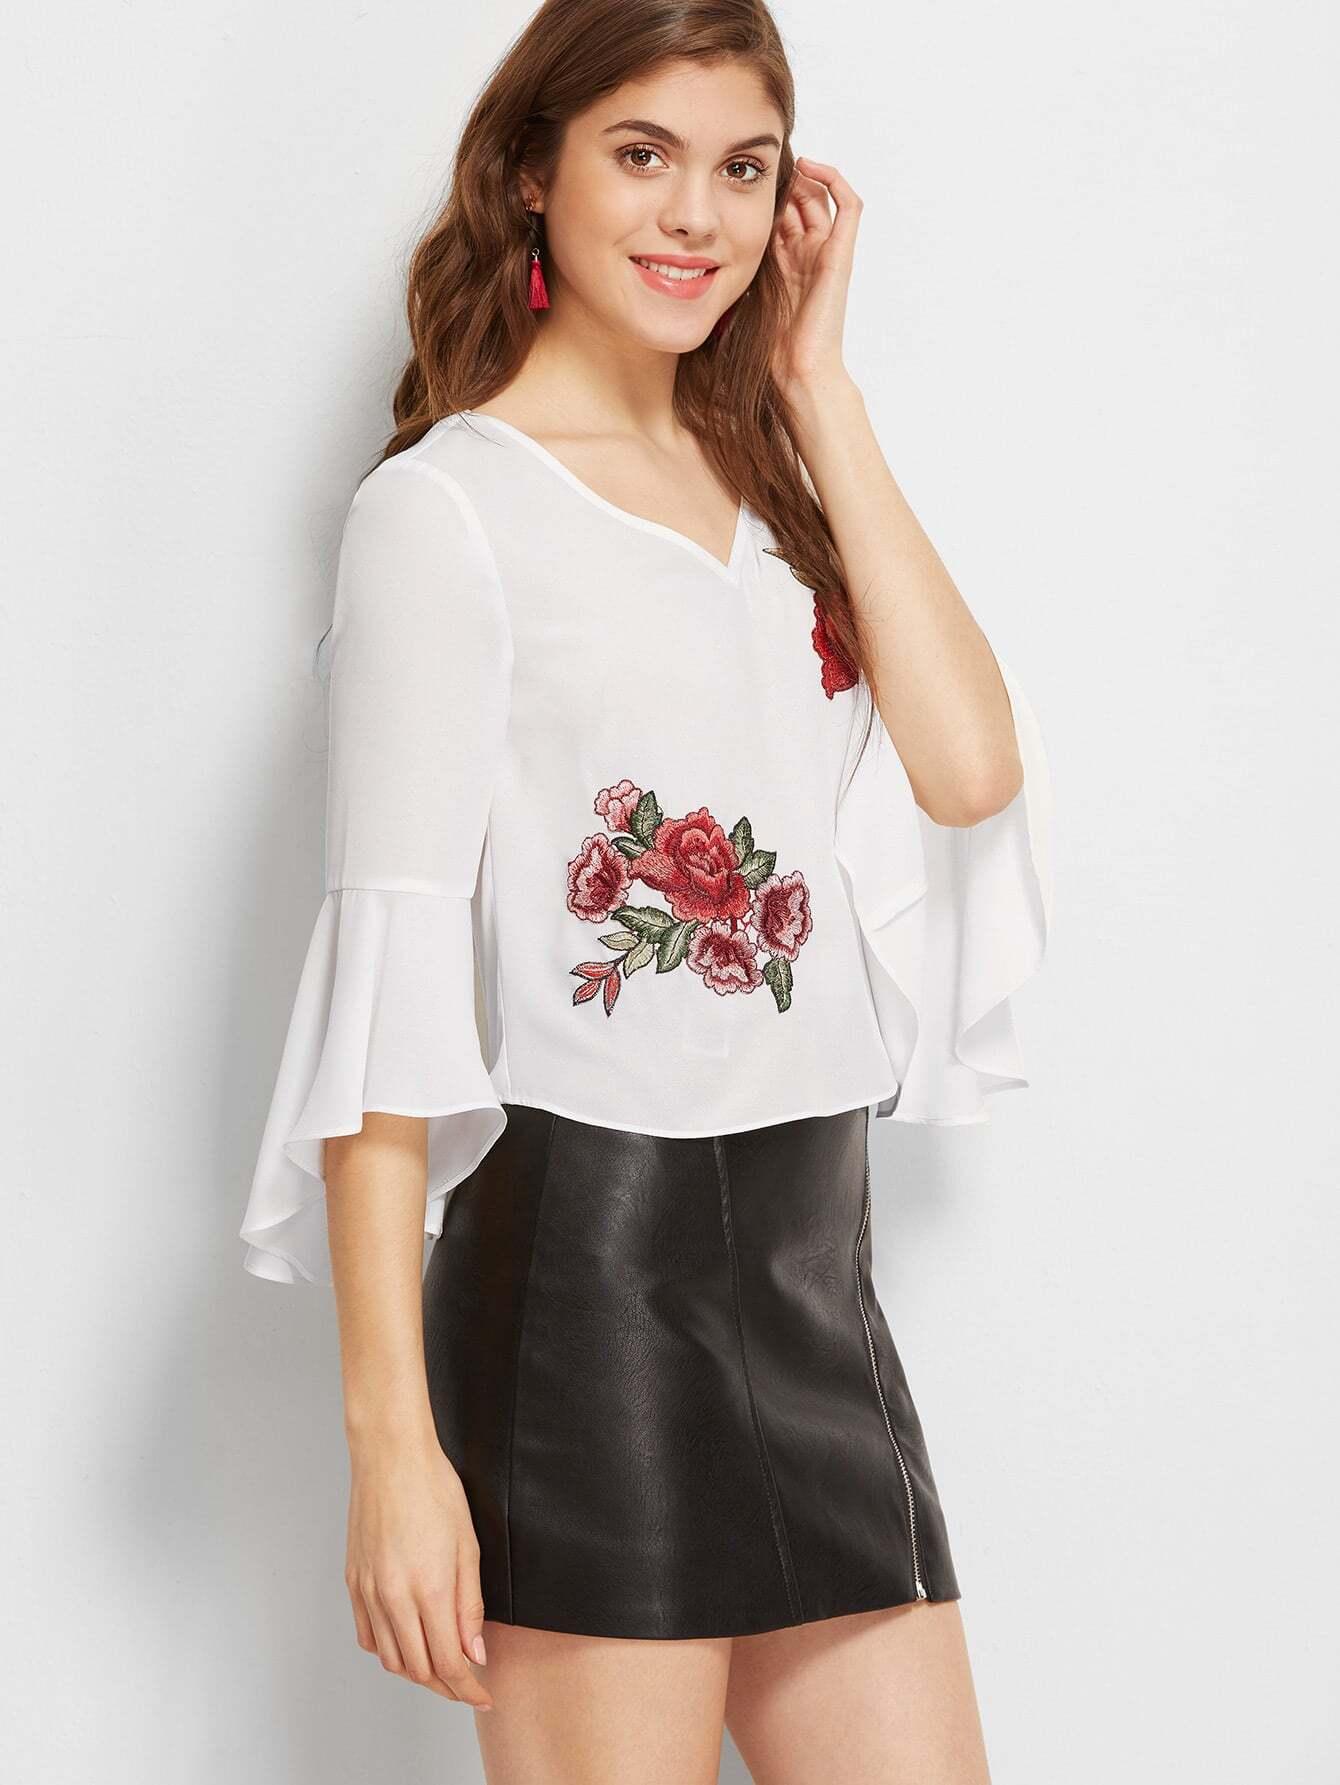 blouse161221704_2